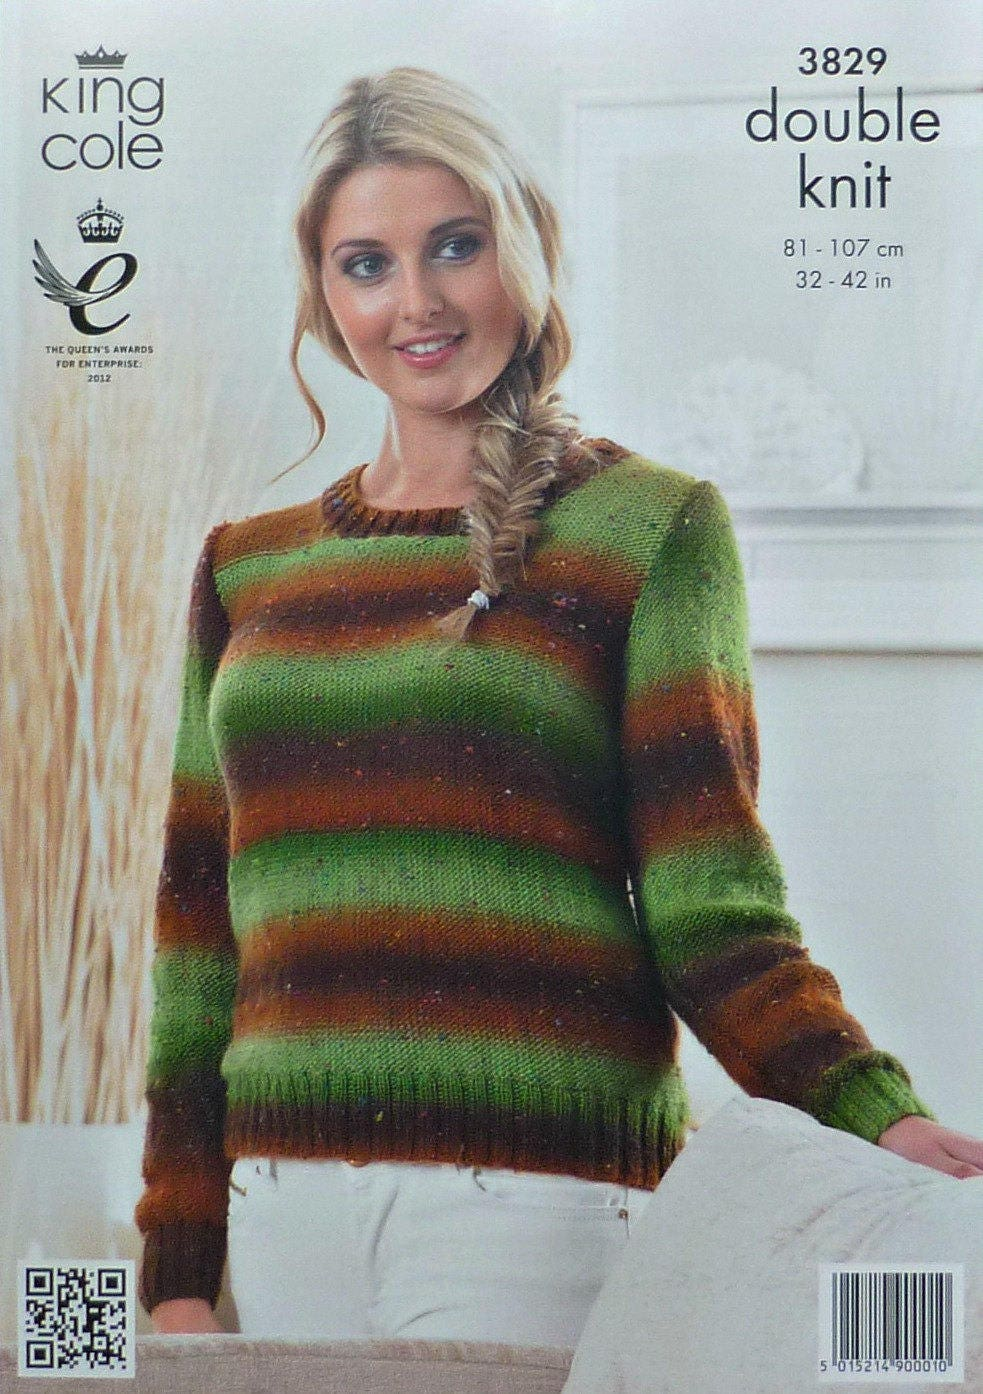 c0b03ab55b06 Womens Knitting Pattern K3829 Ladies Easy Knit Long Sleeve Round Neck Jumper  Knitting Pattern DK (Light Worsted) King Cole from KnittingPatterns4U on  Etsy ...